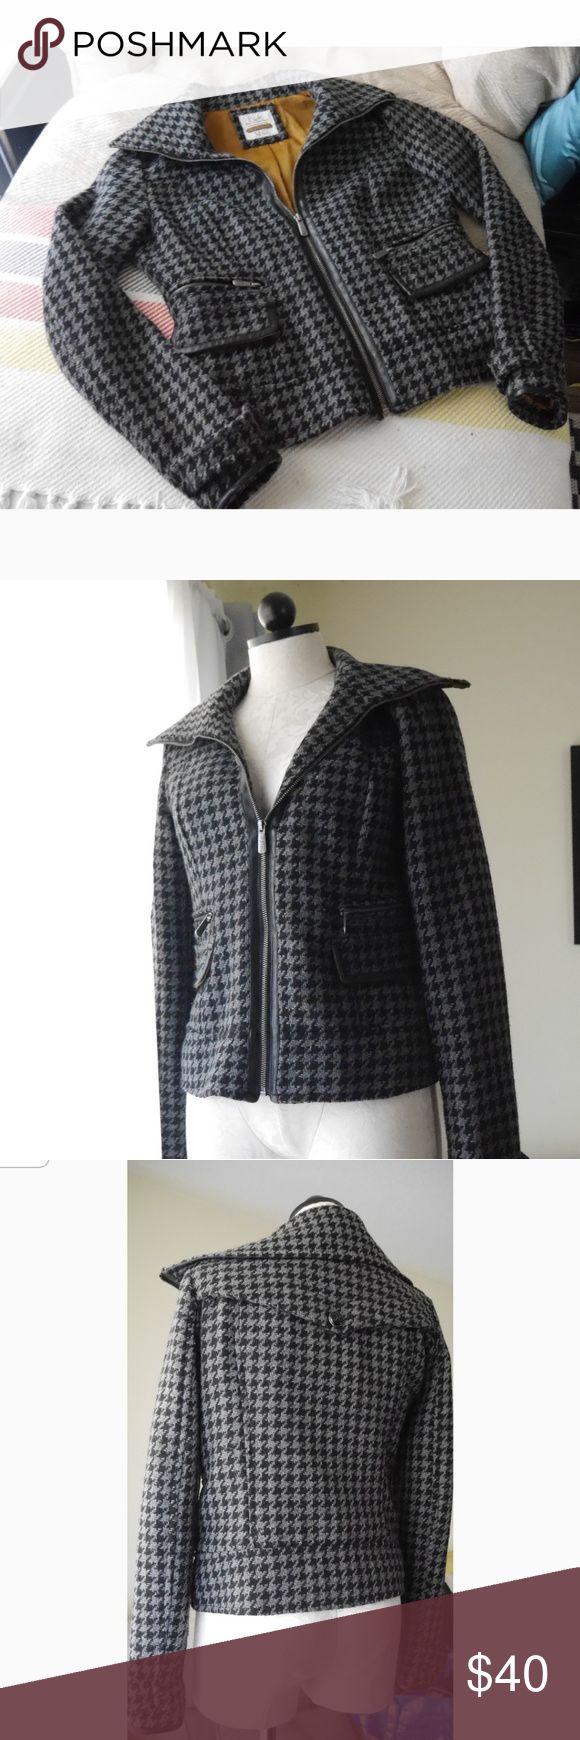 Houndstooth Bershka Jacket NWOT Super cool and stylish